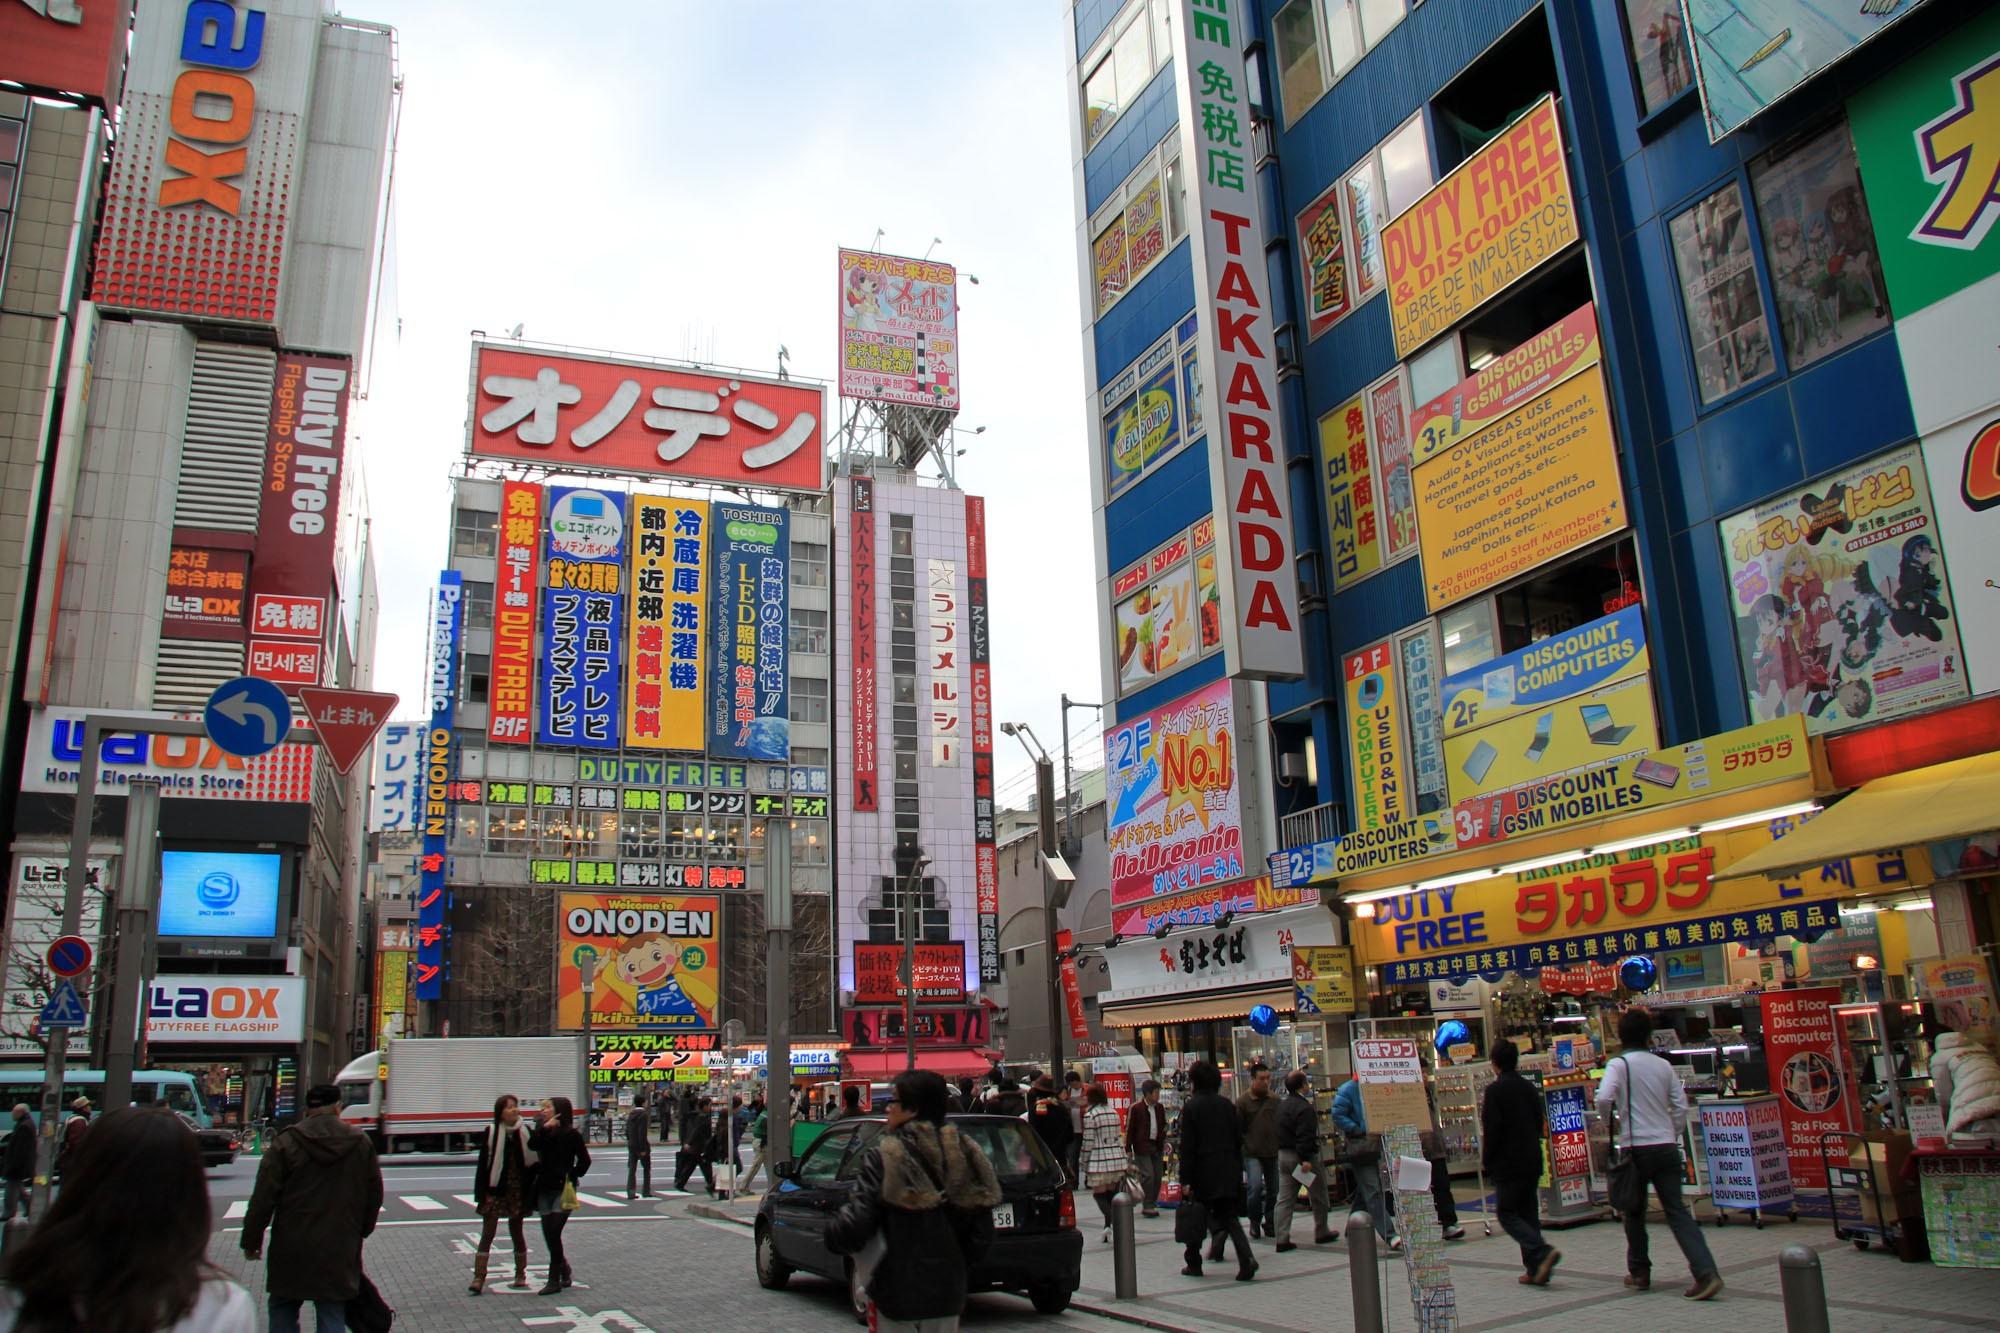 Site de rencontre geek otaku